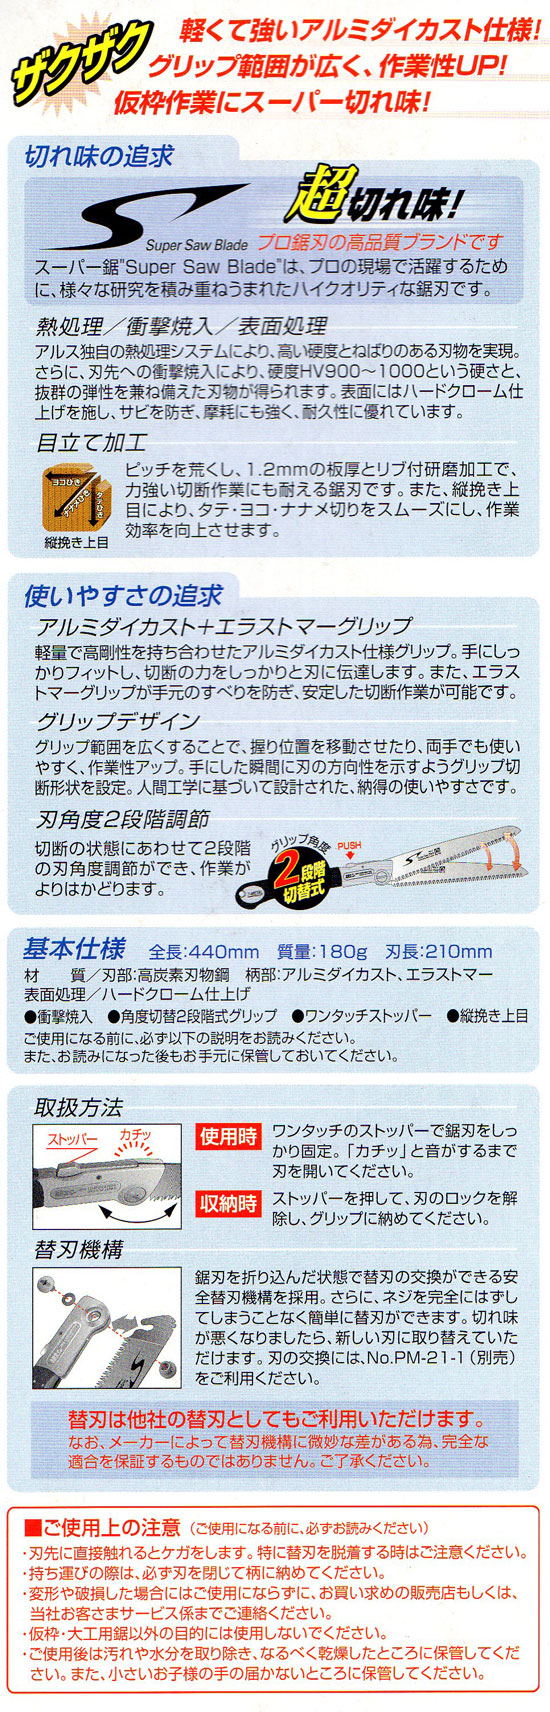 ARS(アルス) 大工用鋸 Pmetal No.PM-21